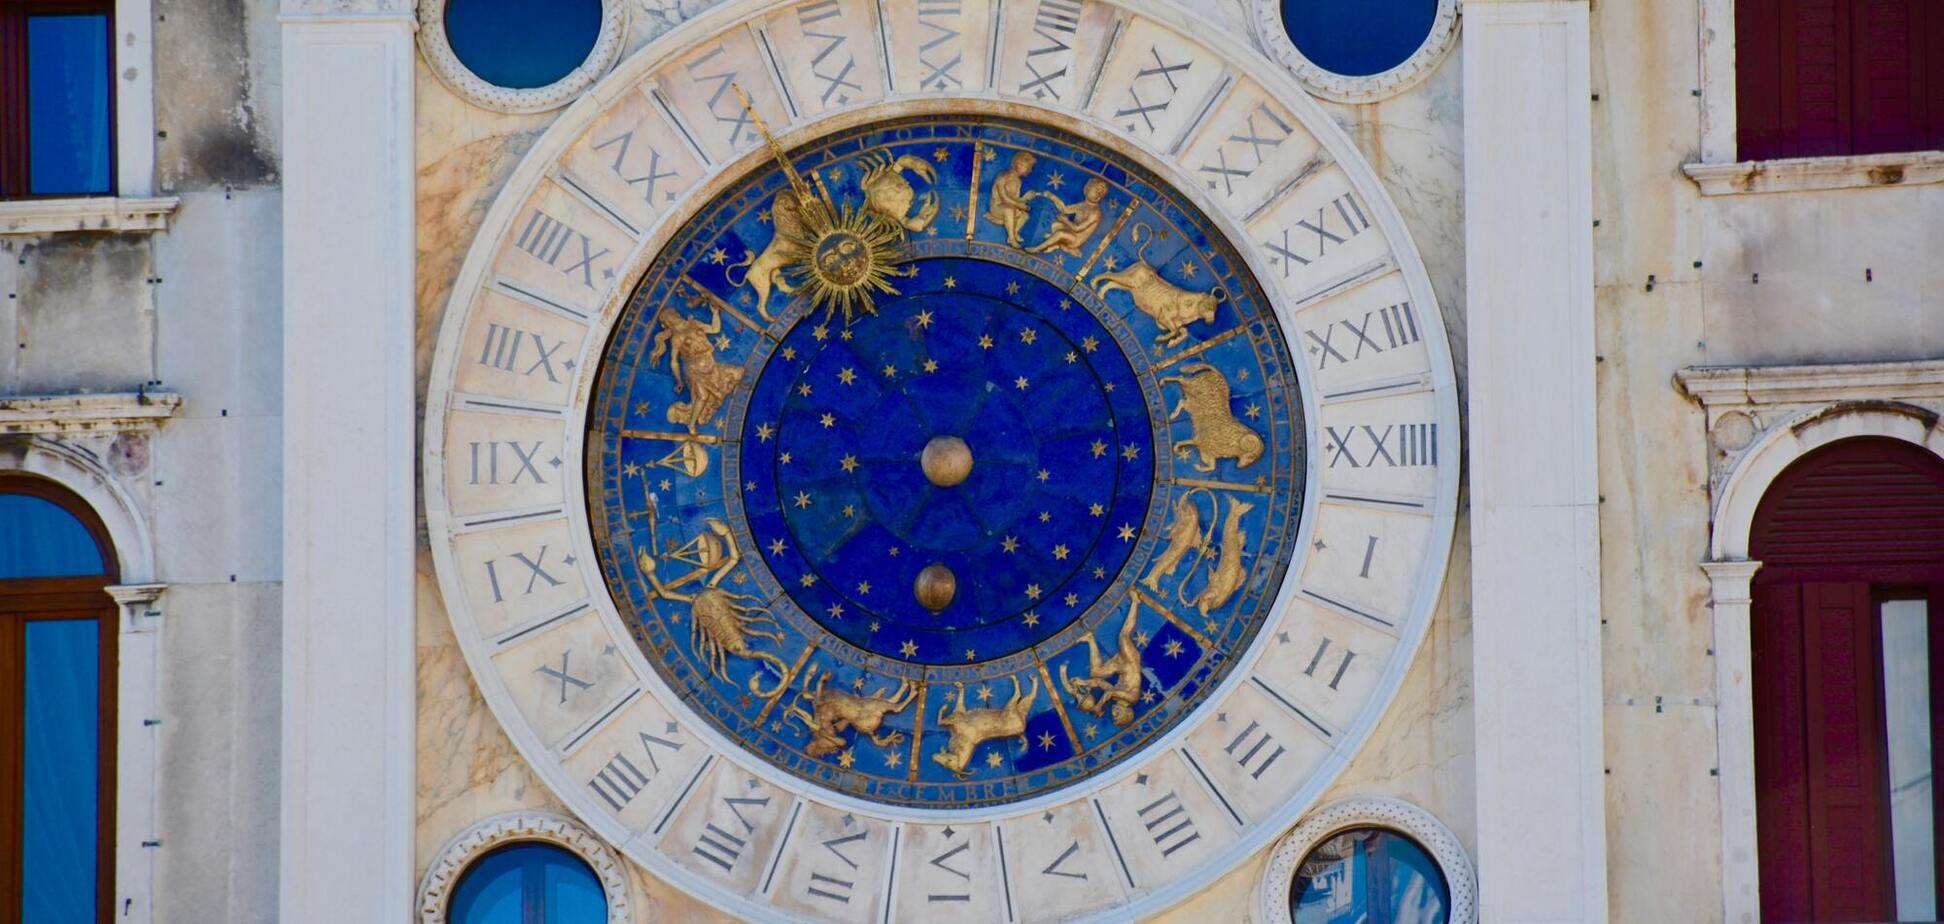 Достоинства знаков зодиака